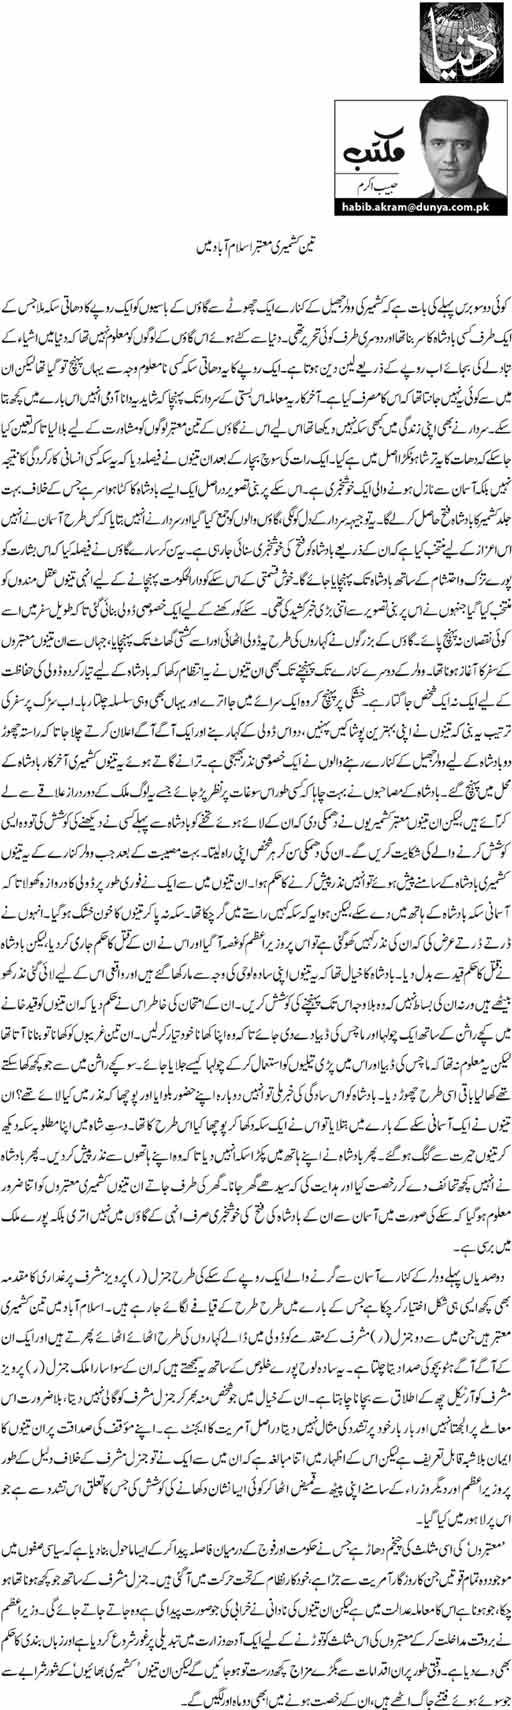 3 Kashmiri Mutabar Islamabad Main - Habib Akram